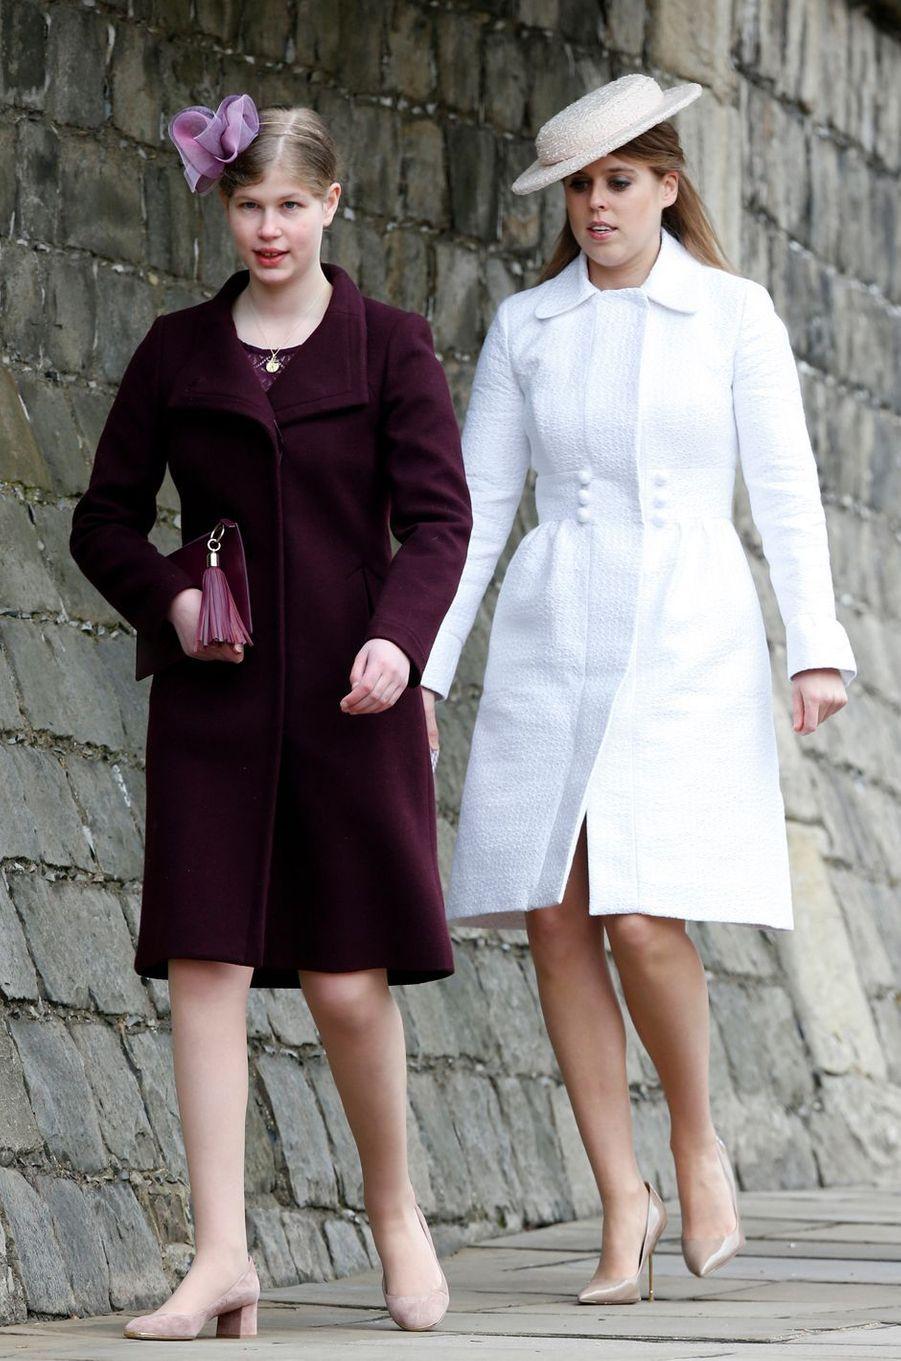 Lady Louise Windsor et la princesse Beatrice d'York à Windsor, le 1er avril 2018